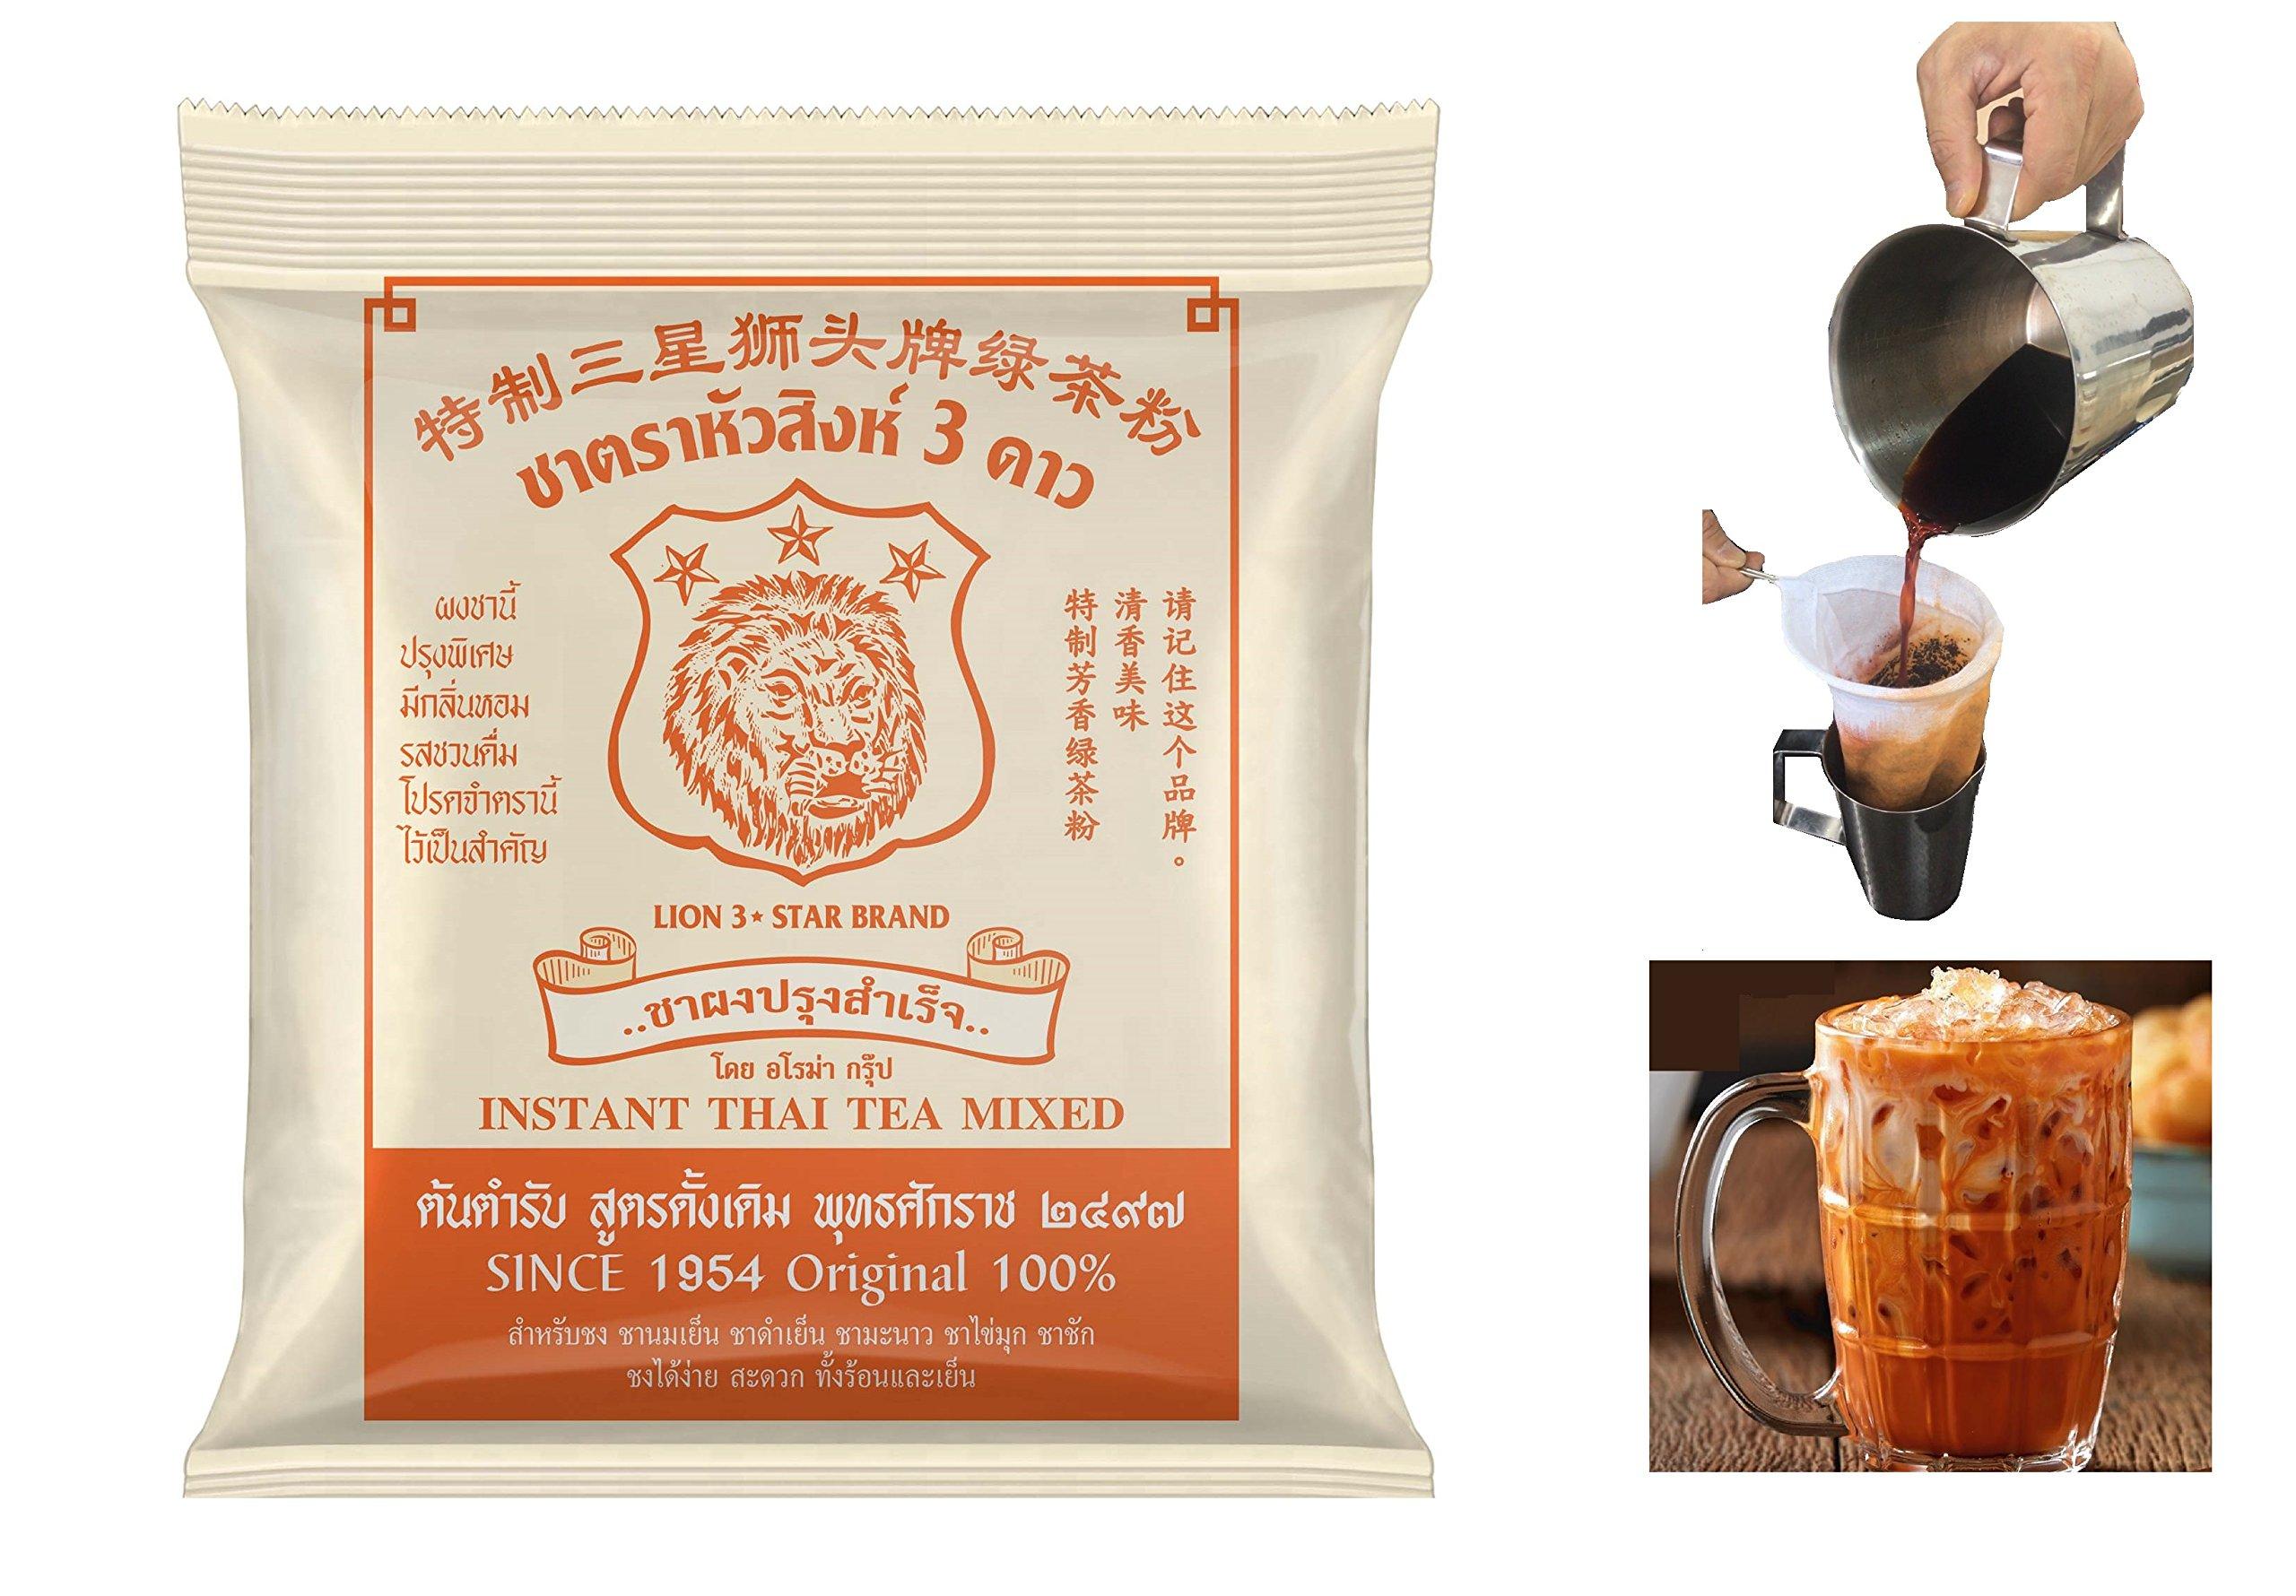 Thai Tea - Number one instant Thai Tea mixed,100% original Natural Loose Leaf Thai tea - 400g | Made from Stronglyt-Brewed Black Tea | Makes Iced Tea and Boba Tea | By Lion 3 Star